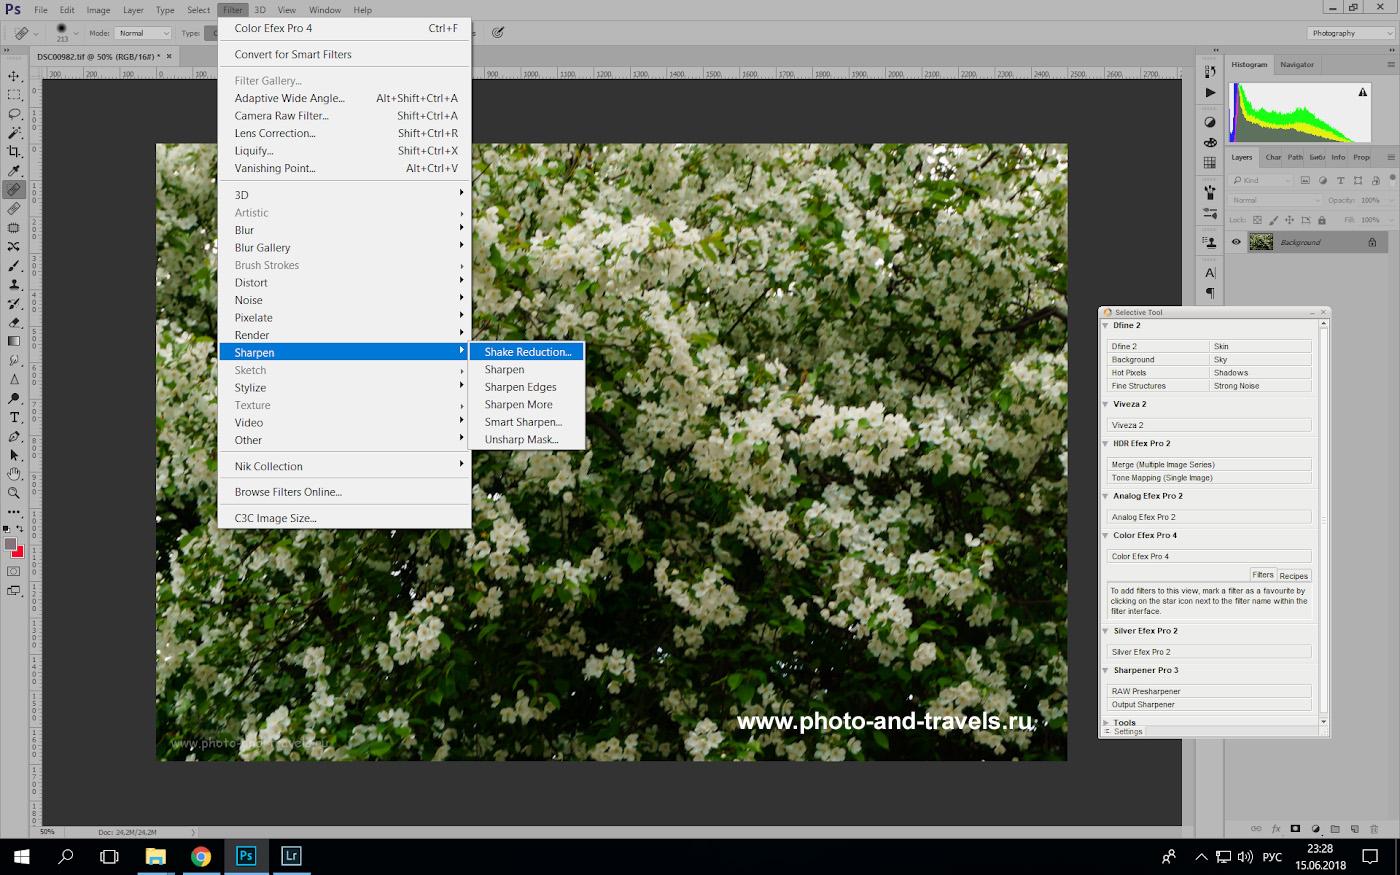 Фотография 3. Как исправить нерезкие снимки в Photoshop. Примеры съемки на Sony A6000 KIT 16-50mm f/3.5-5.6.